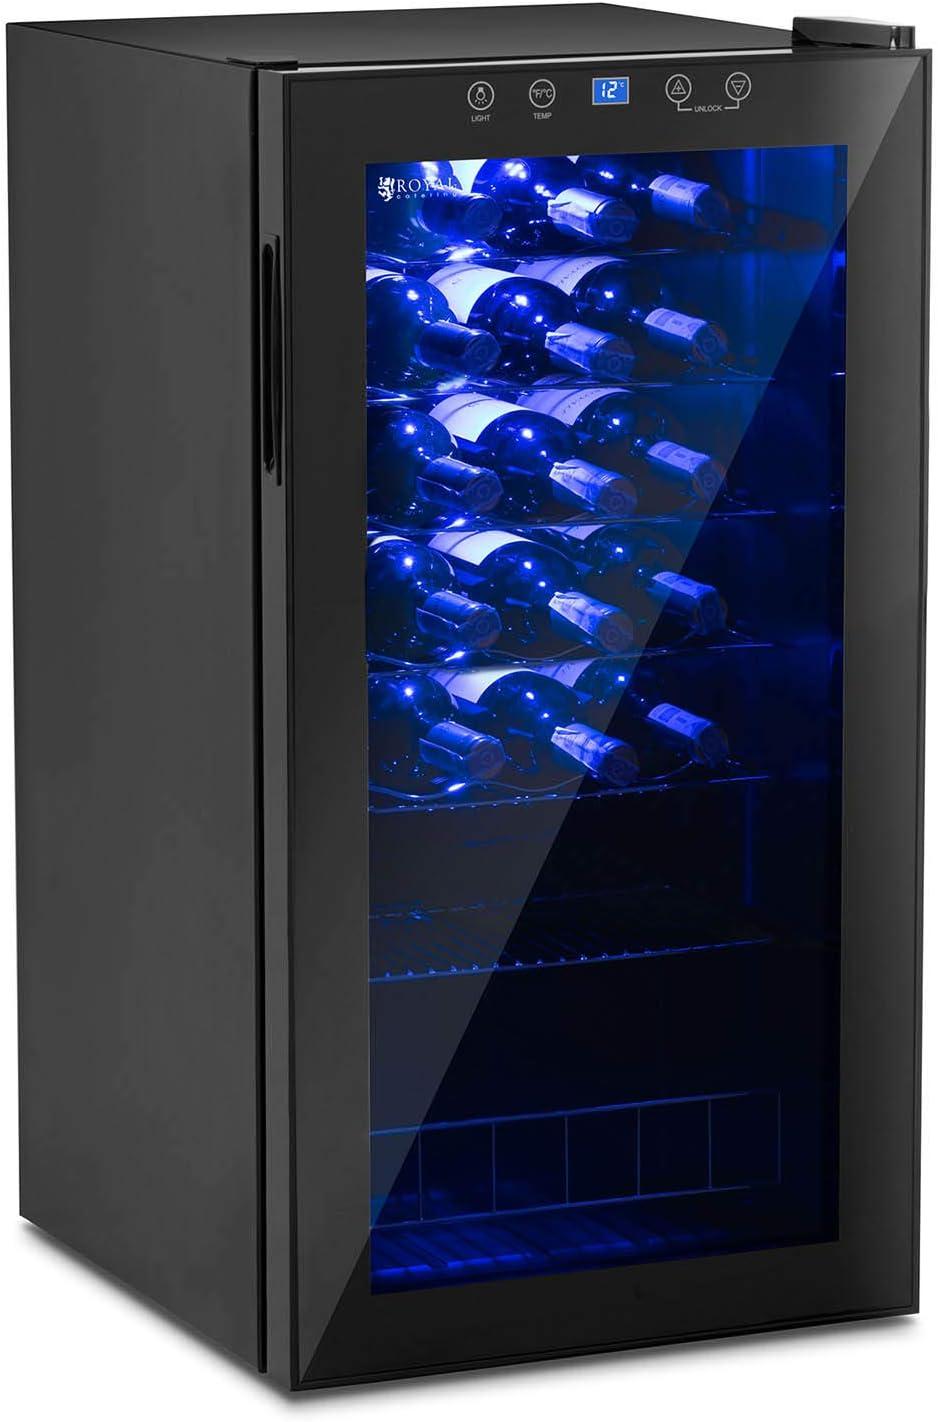 Royal Catering Small Wine Fridge Drinks Fridge Wine Refrigerator Wine Cooler 82L 28 Bottles RCWI-88L Powder-Coated Steel, Tempered Glass, Black, LED